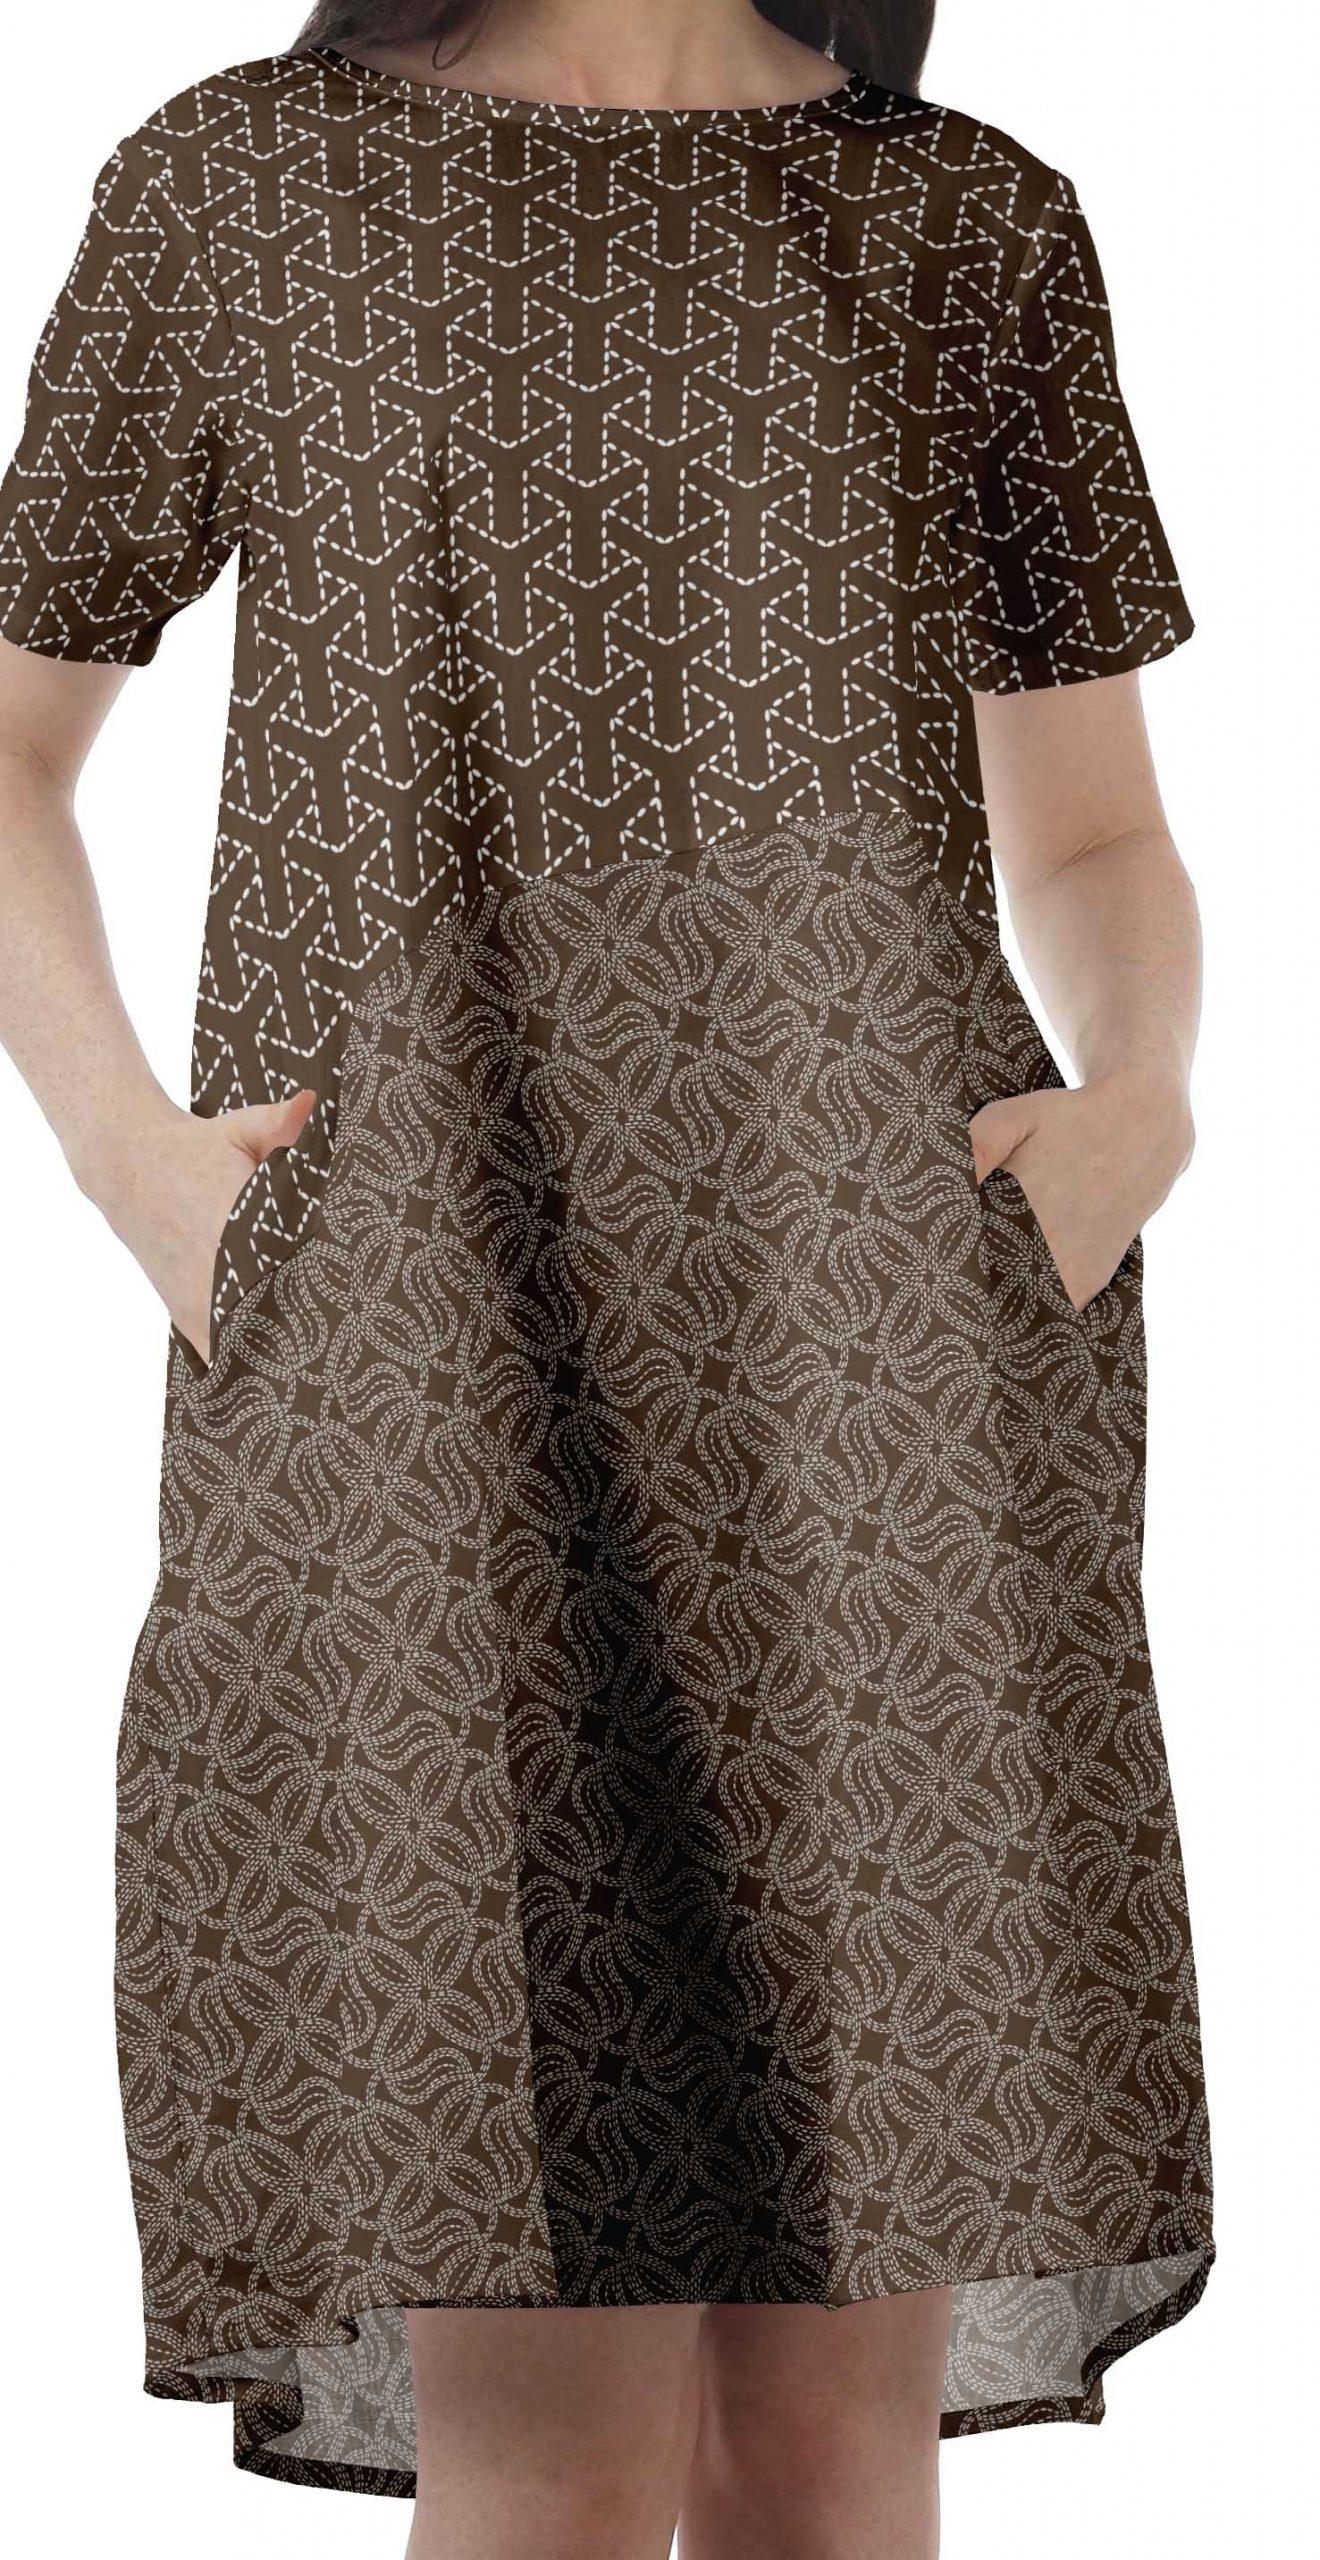 Moomaya Baumwolle Flex Tunika Kleid Frauen Kurzarm